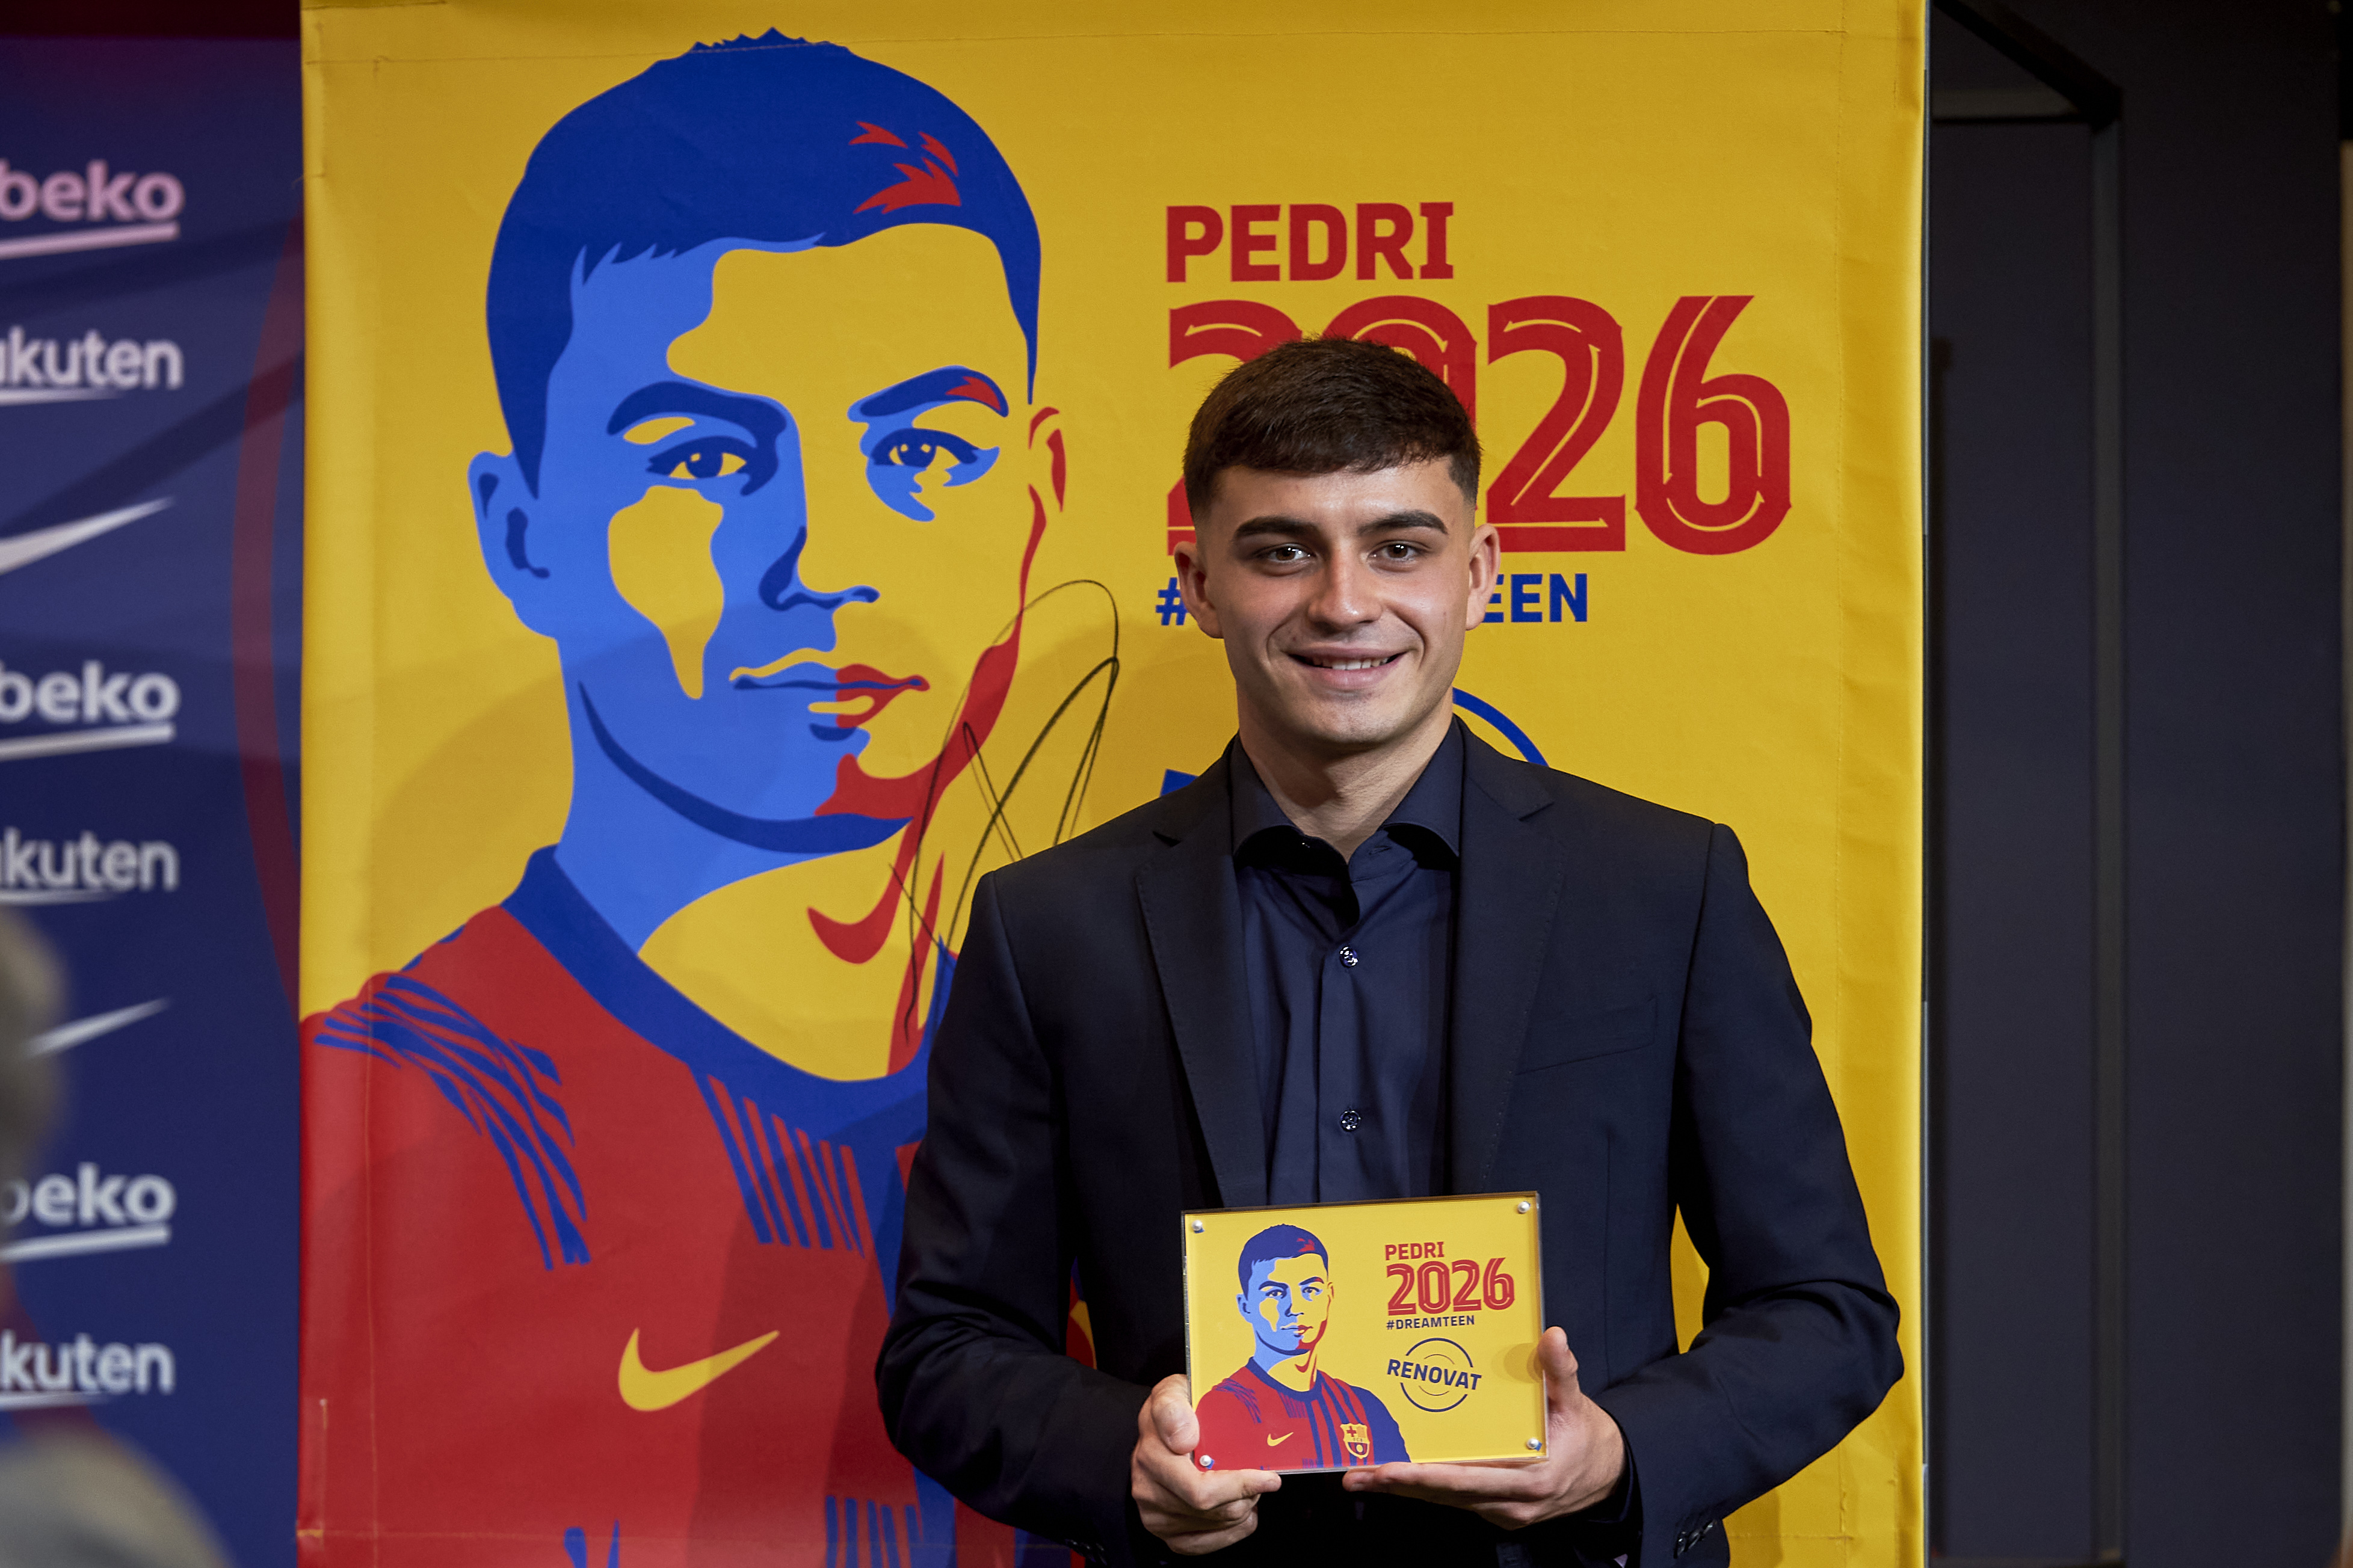 Pedri Signs With FC Barcelona